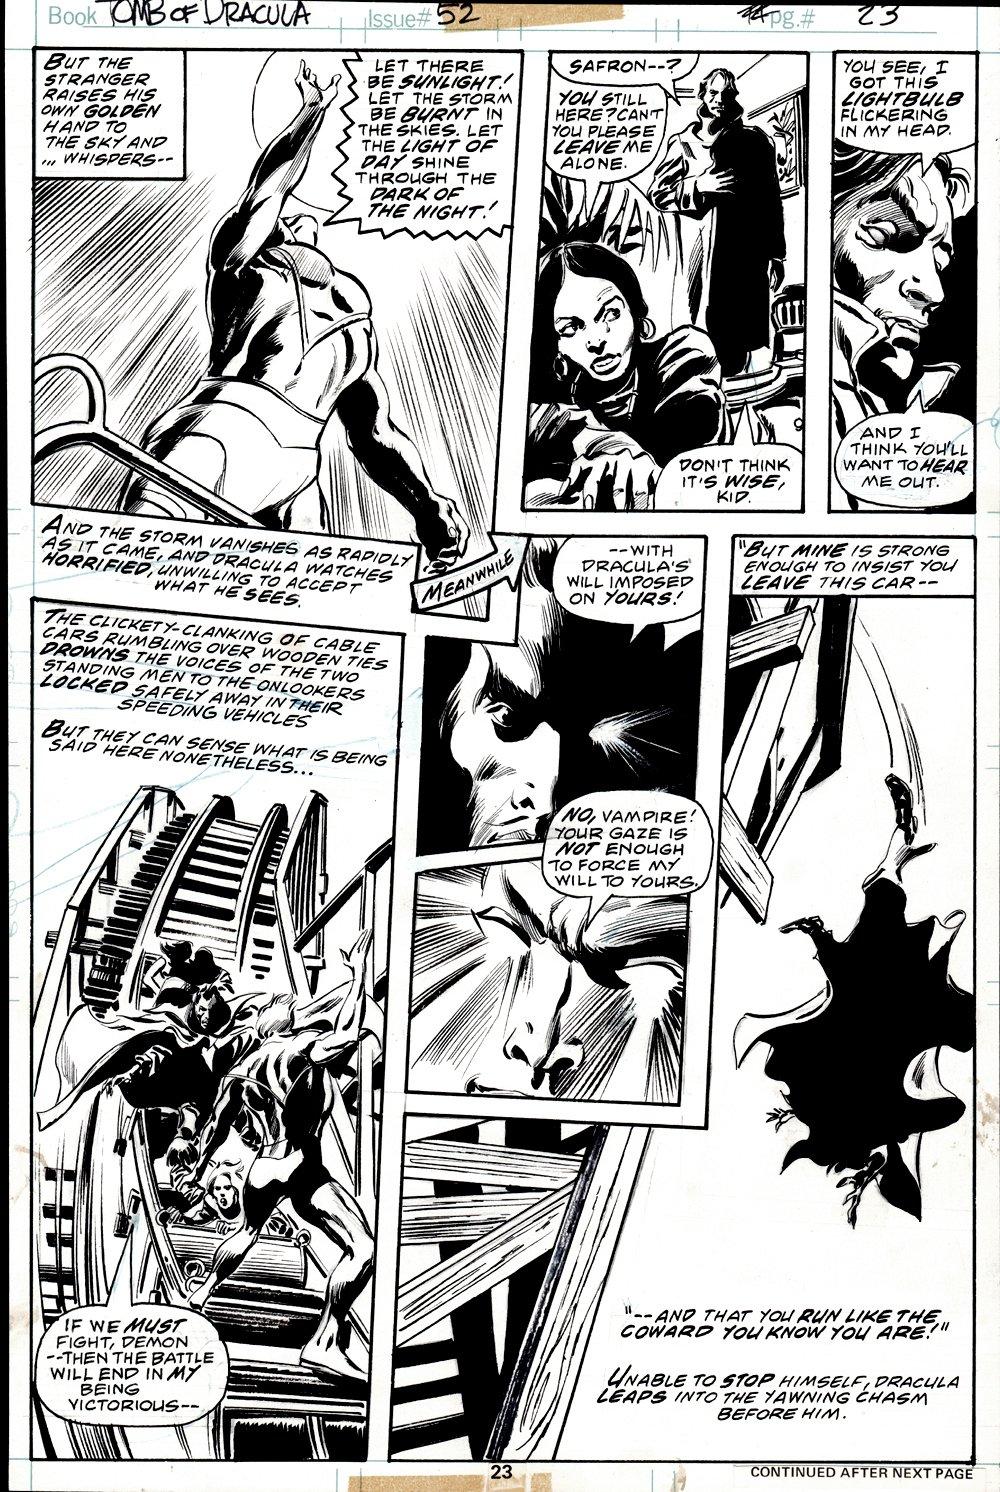 Tomb of Dracula #52 p 23 (COVER SCENE! DRACULA BATTLES THE GOLDEN ANGEL!) 1976